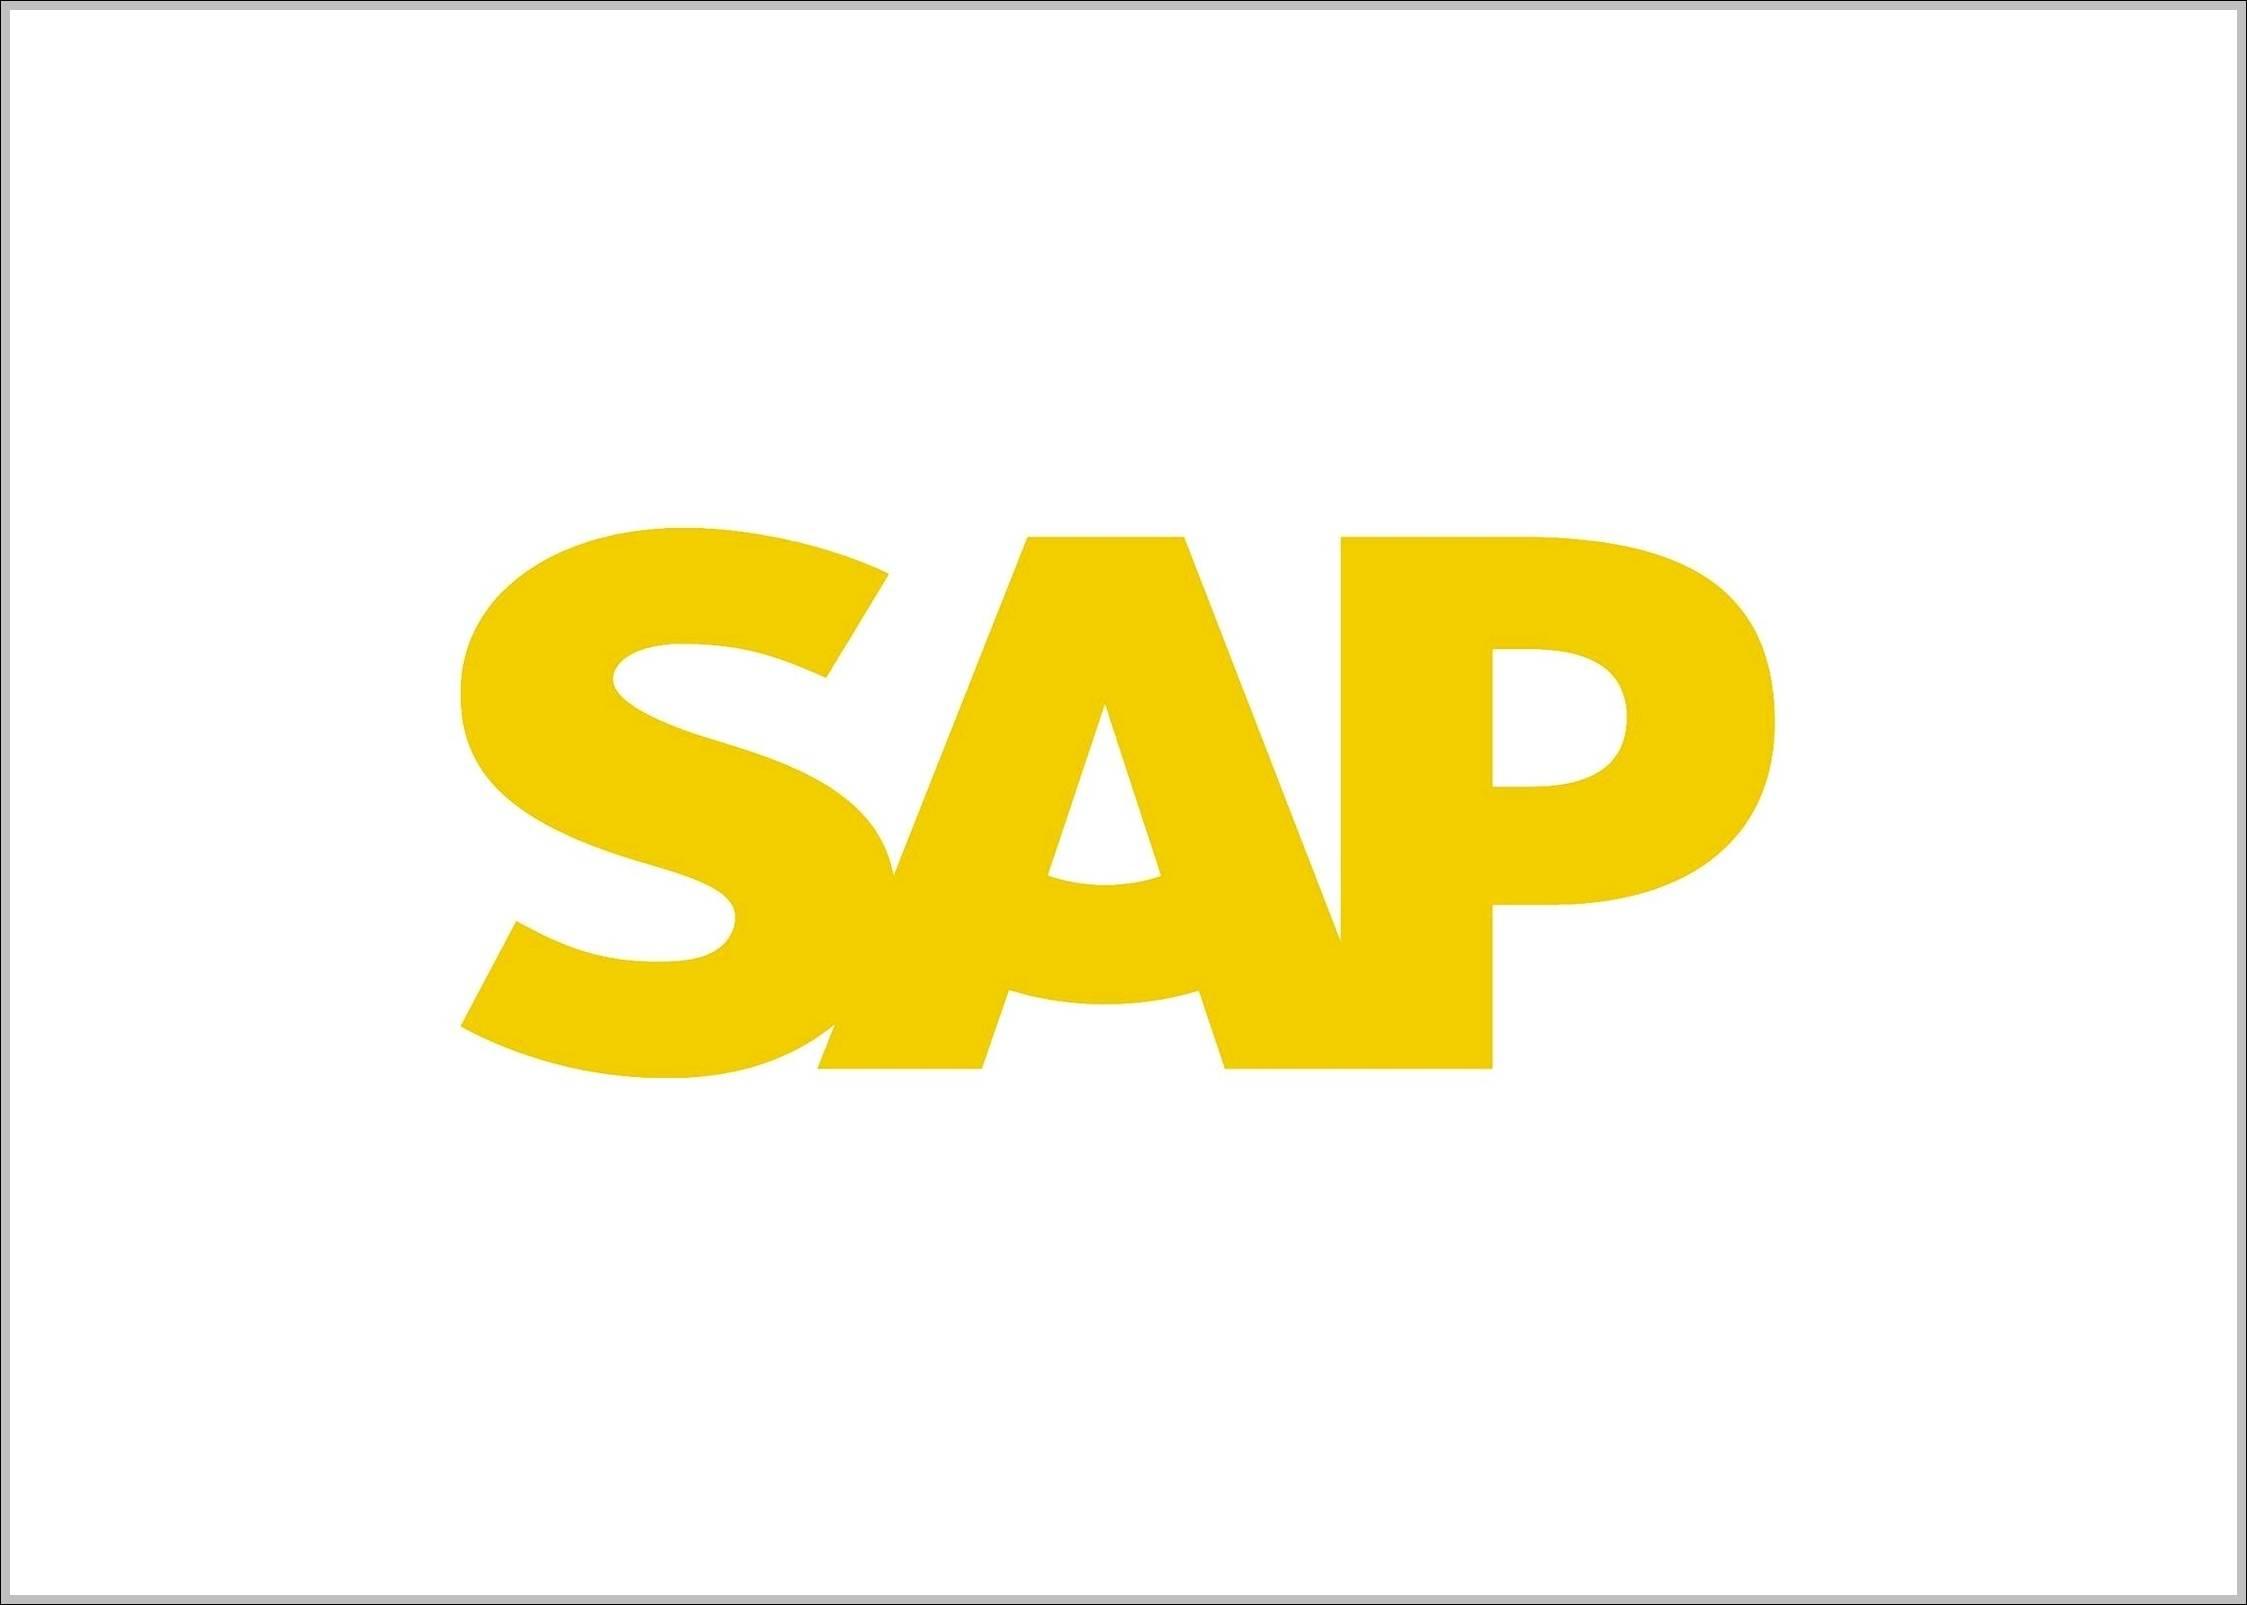 SAP logo 2014